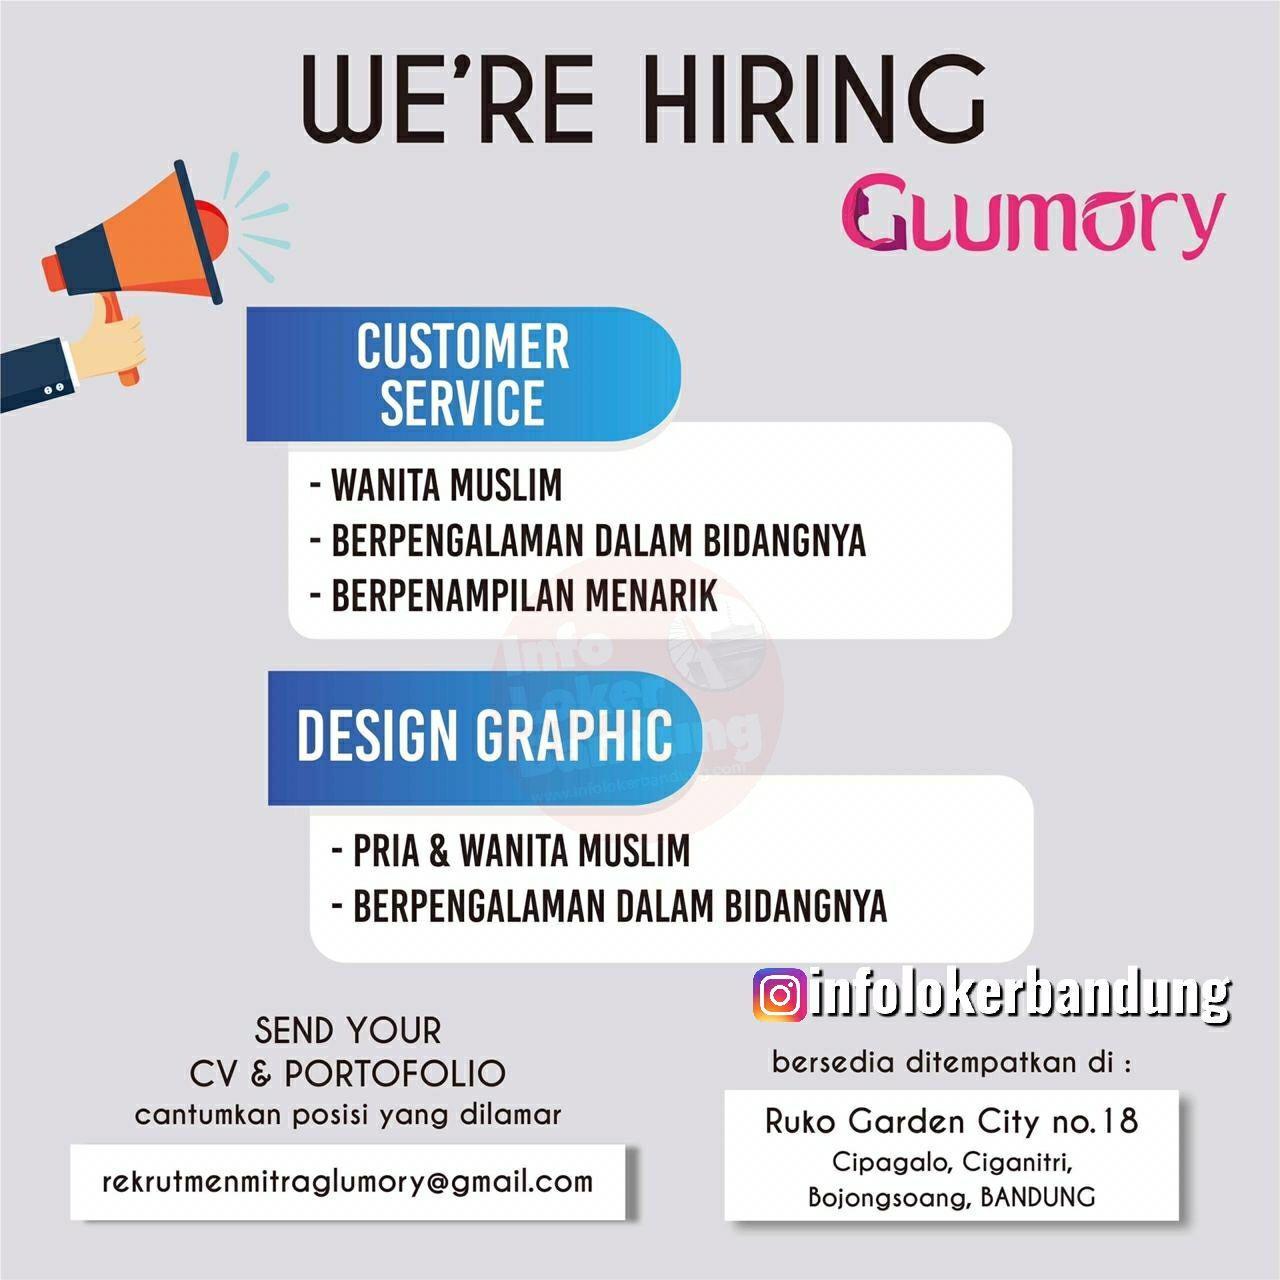 Lowongan Kerja Customer Service & Design Graphic Glumory Bandung Oktober 2019